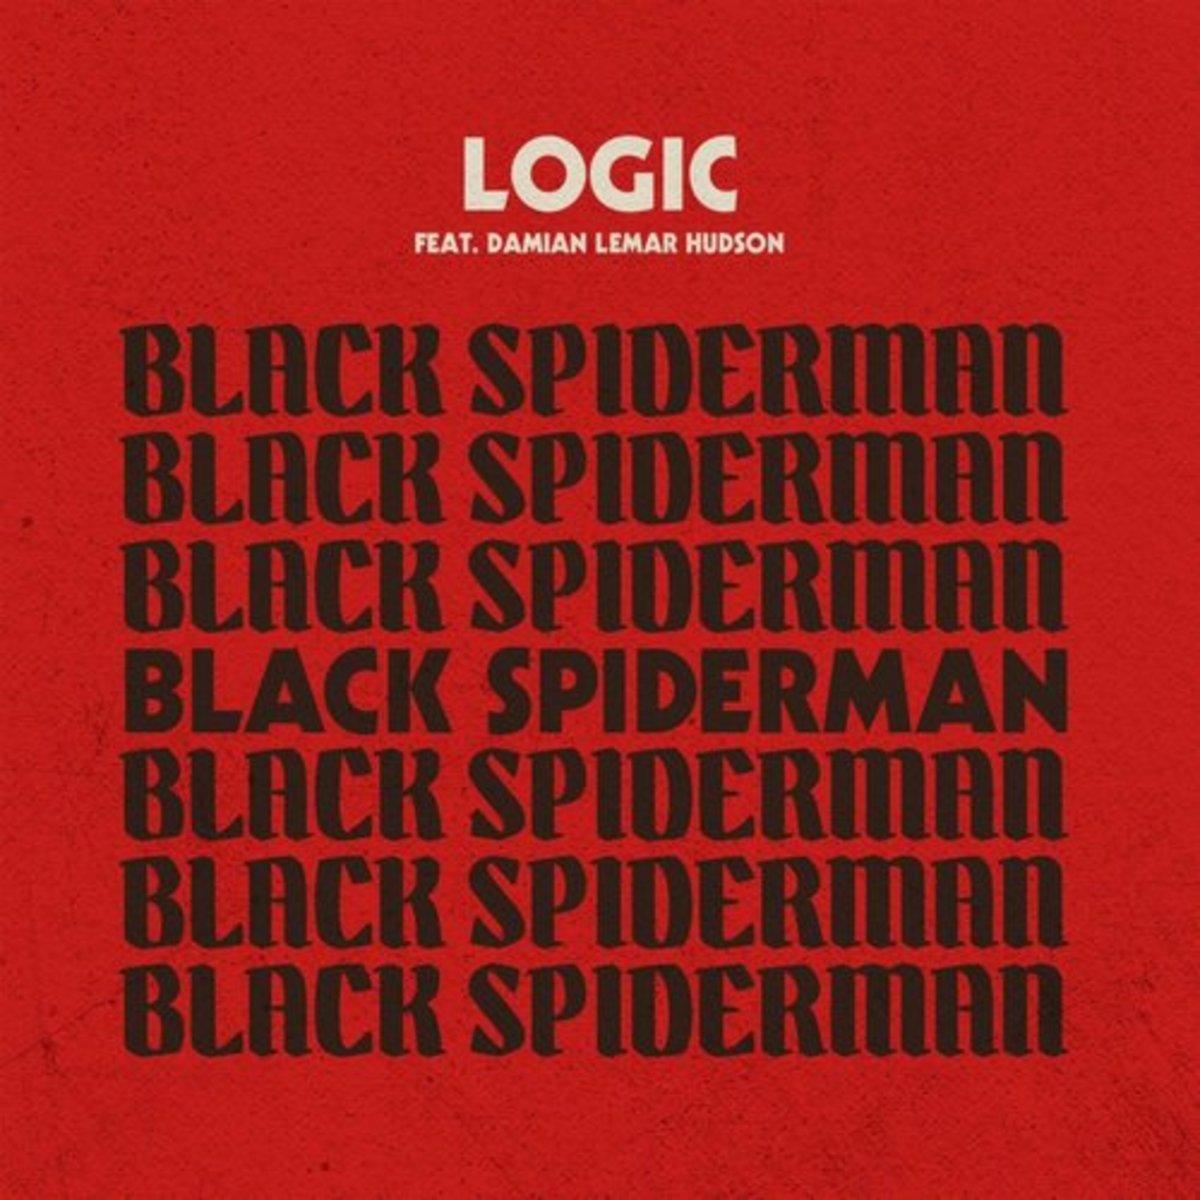 logic-black-spiderman.jpg